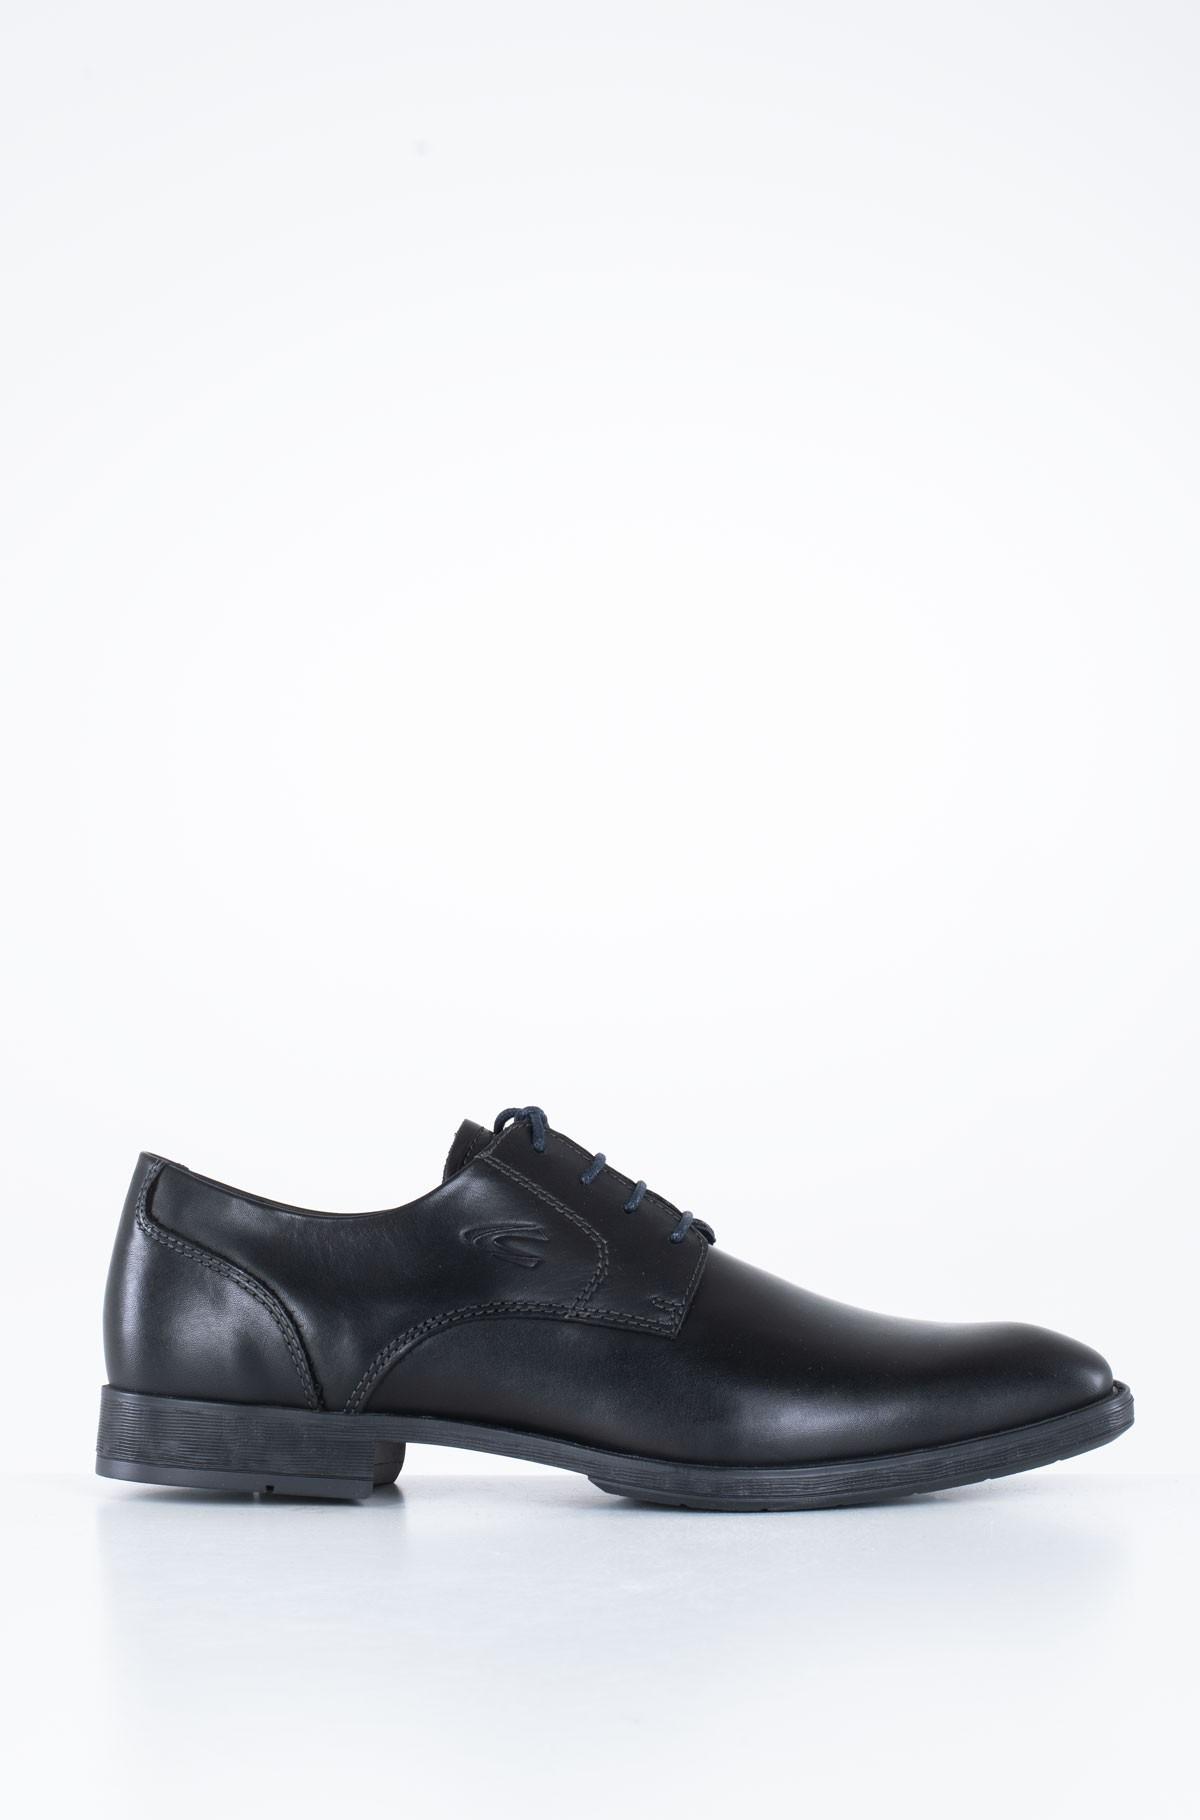 Shoes 474.13.01-full-1